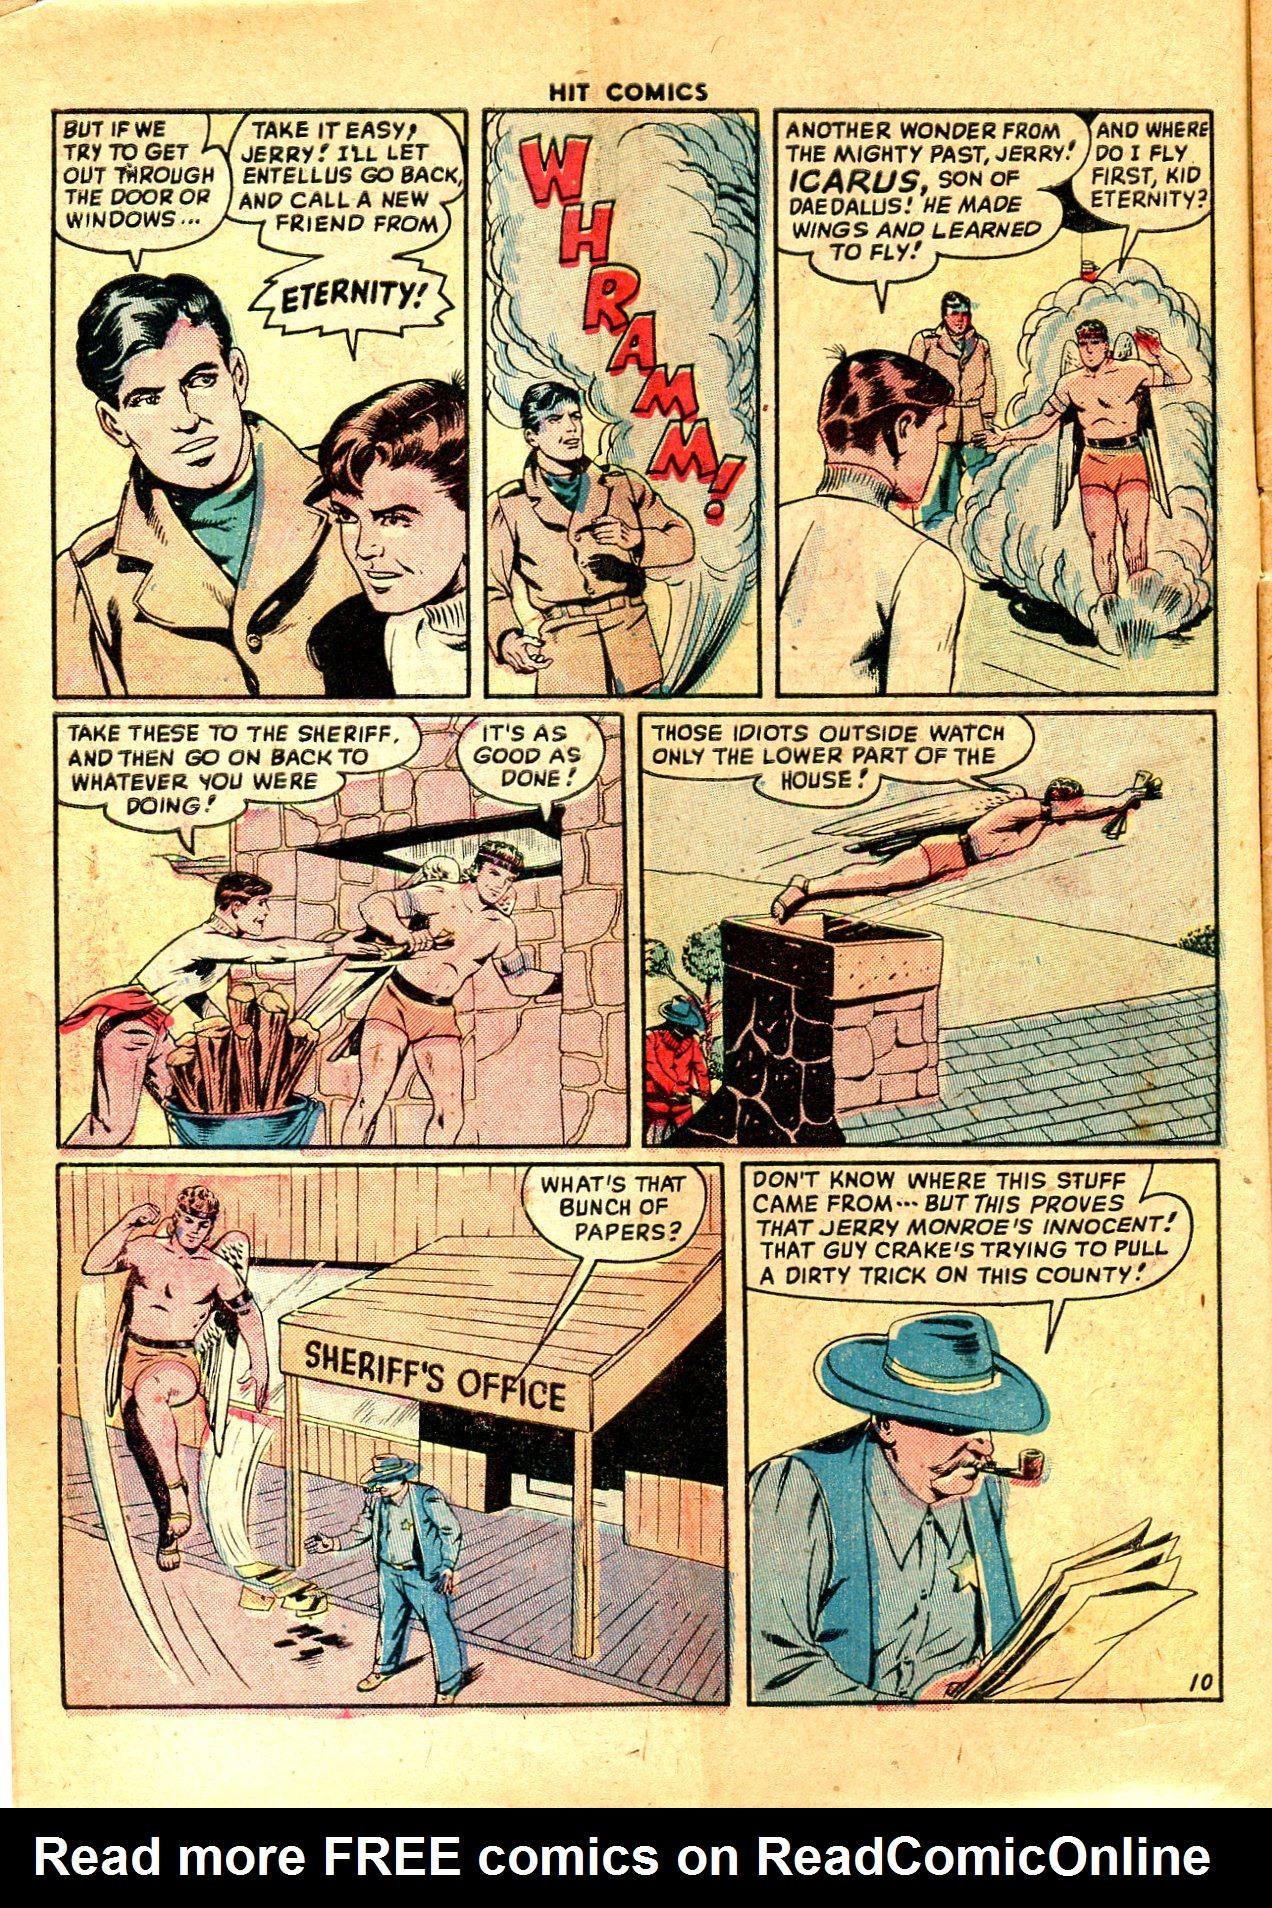 Read online Hit Comics comic -  Issue #57 - 12